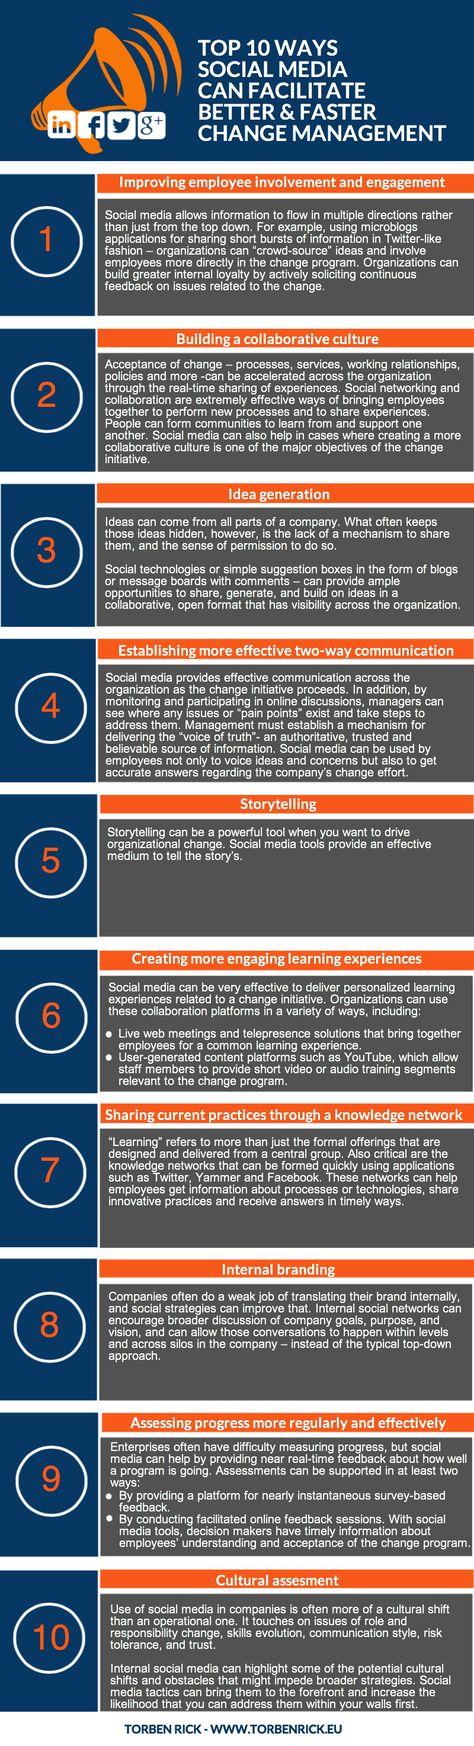 Organizational change management through social media